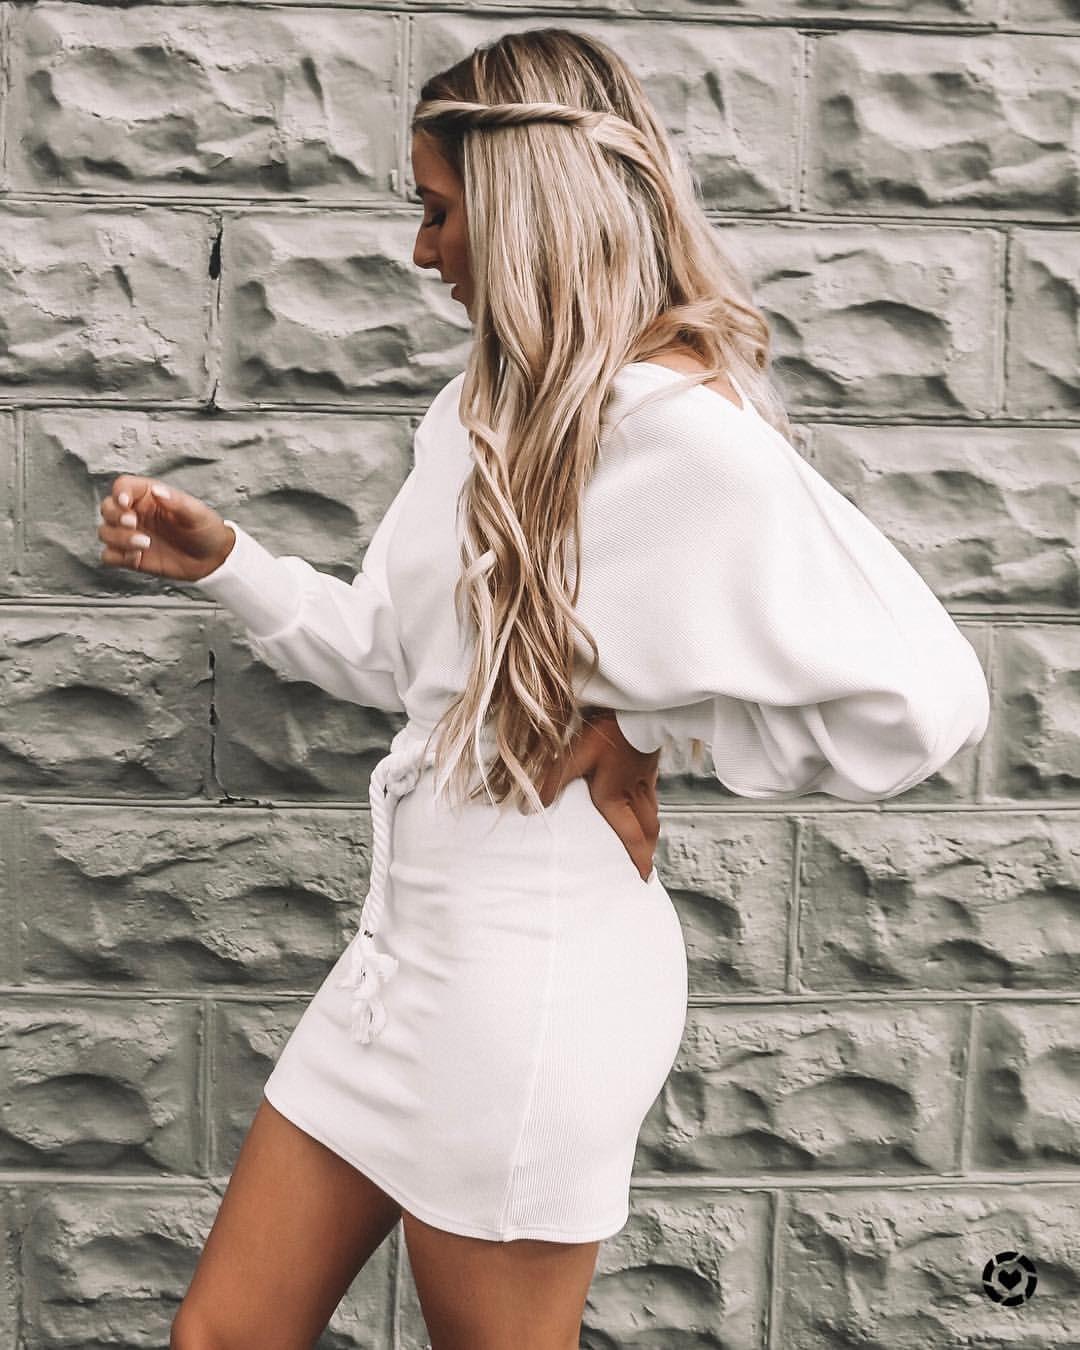 Alexa Rae Withalexarae On Instagram Found My New Spring Dress